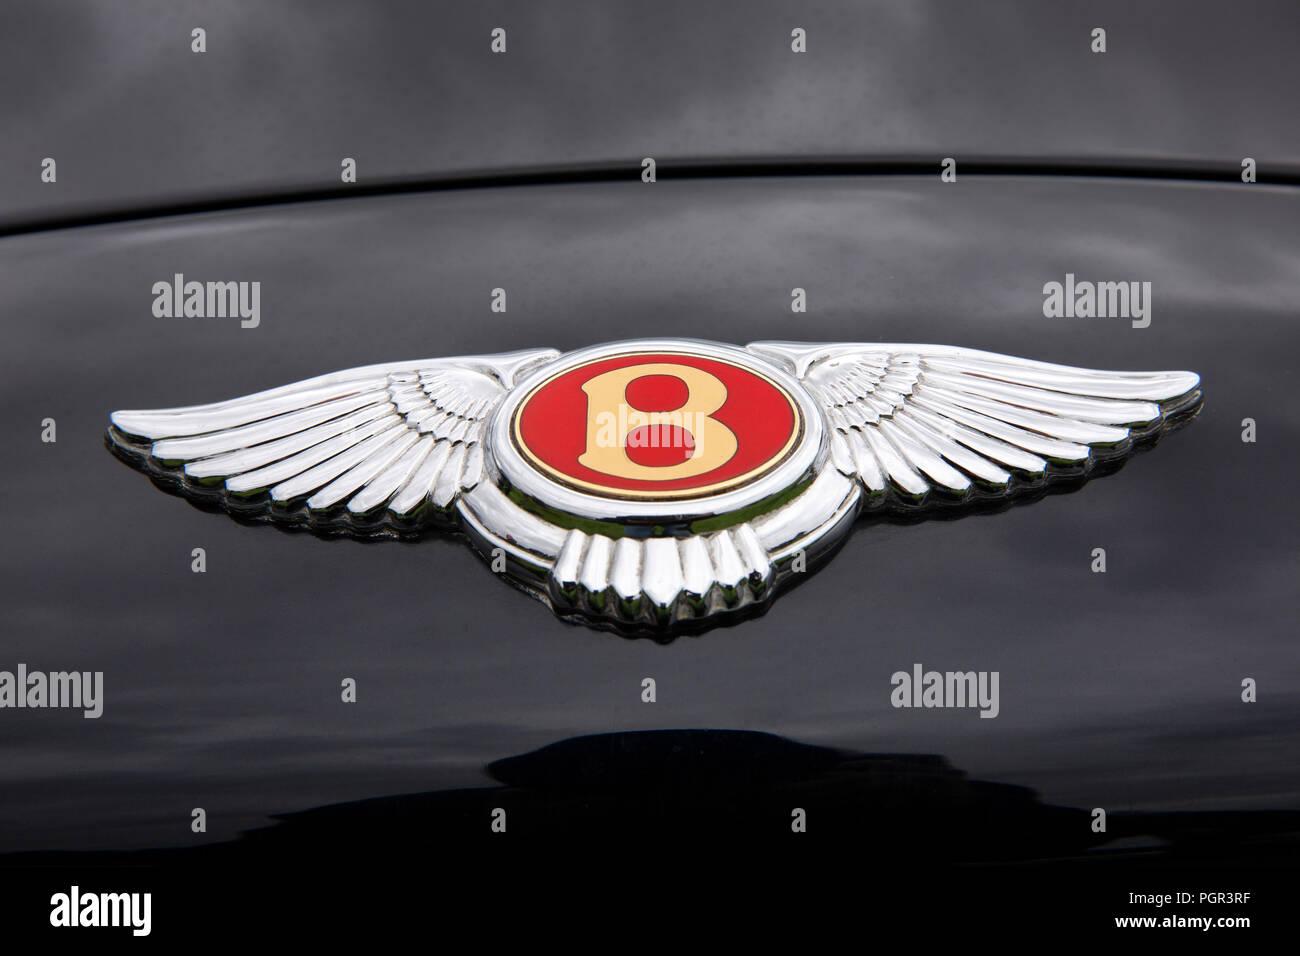 UK, England, Cheshire, Stockport, Woodsmoor Car Show, flying B badge on bonnet of Bentley Flying Spur car Stock Photo